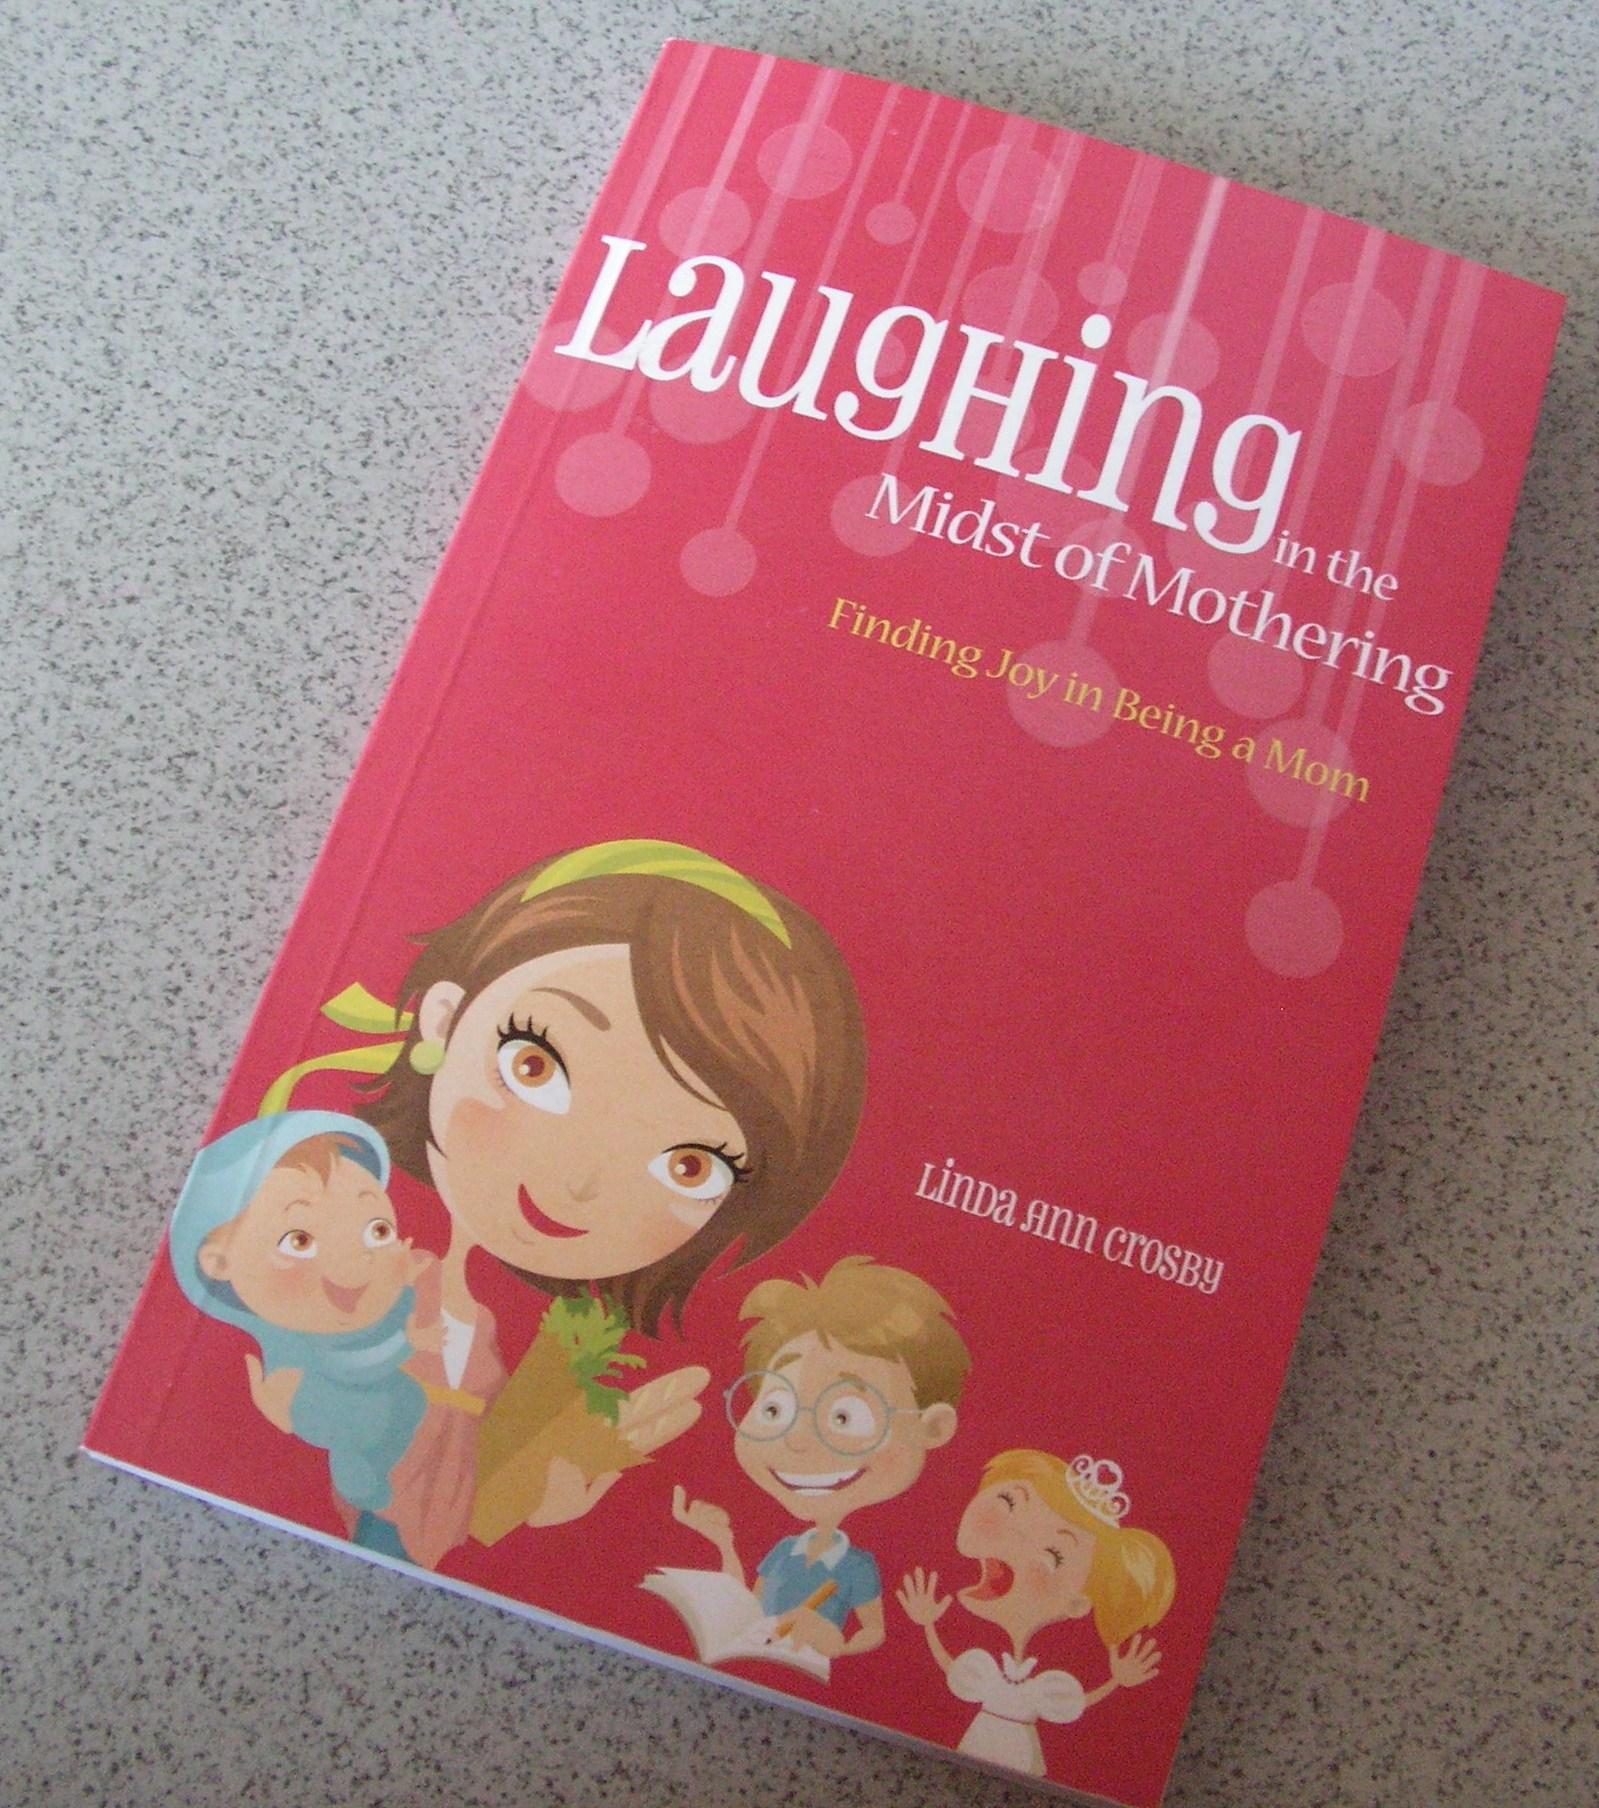 Finding Joy in Being a Mom by Linda Ann Crosby